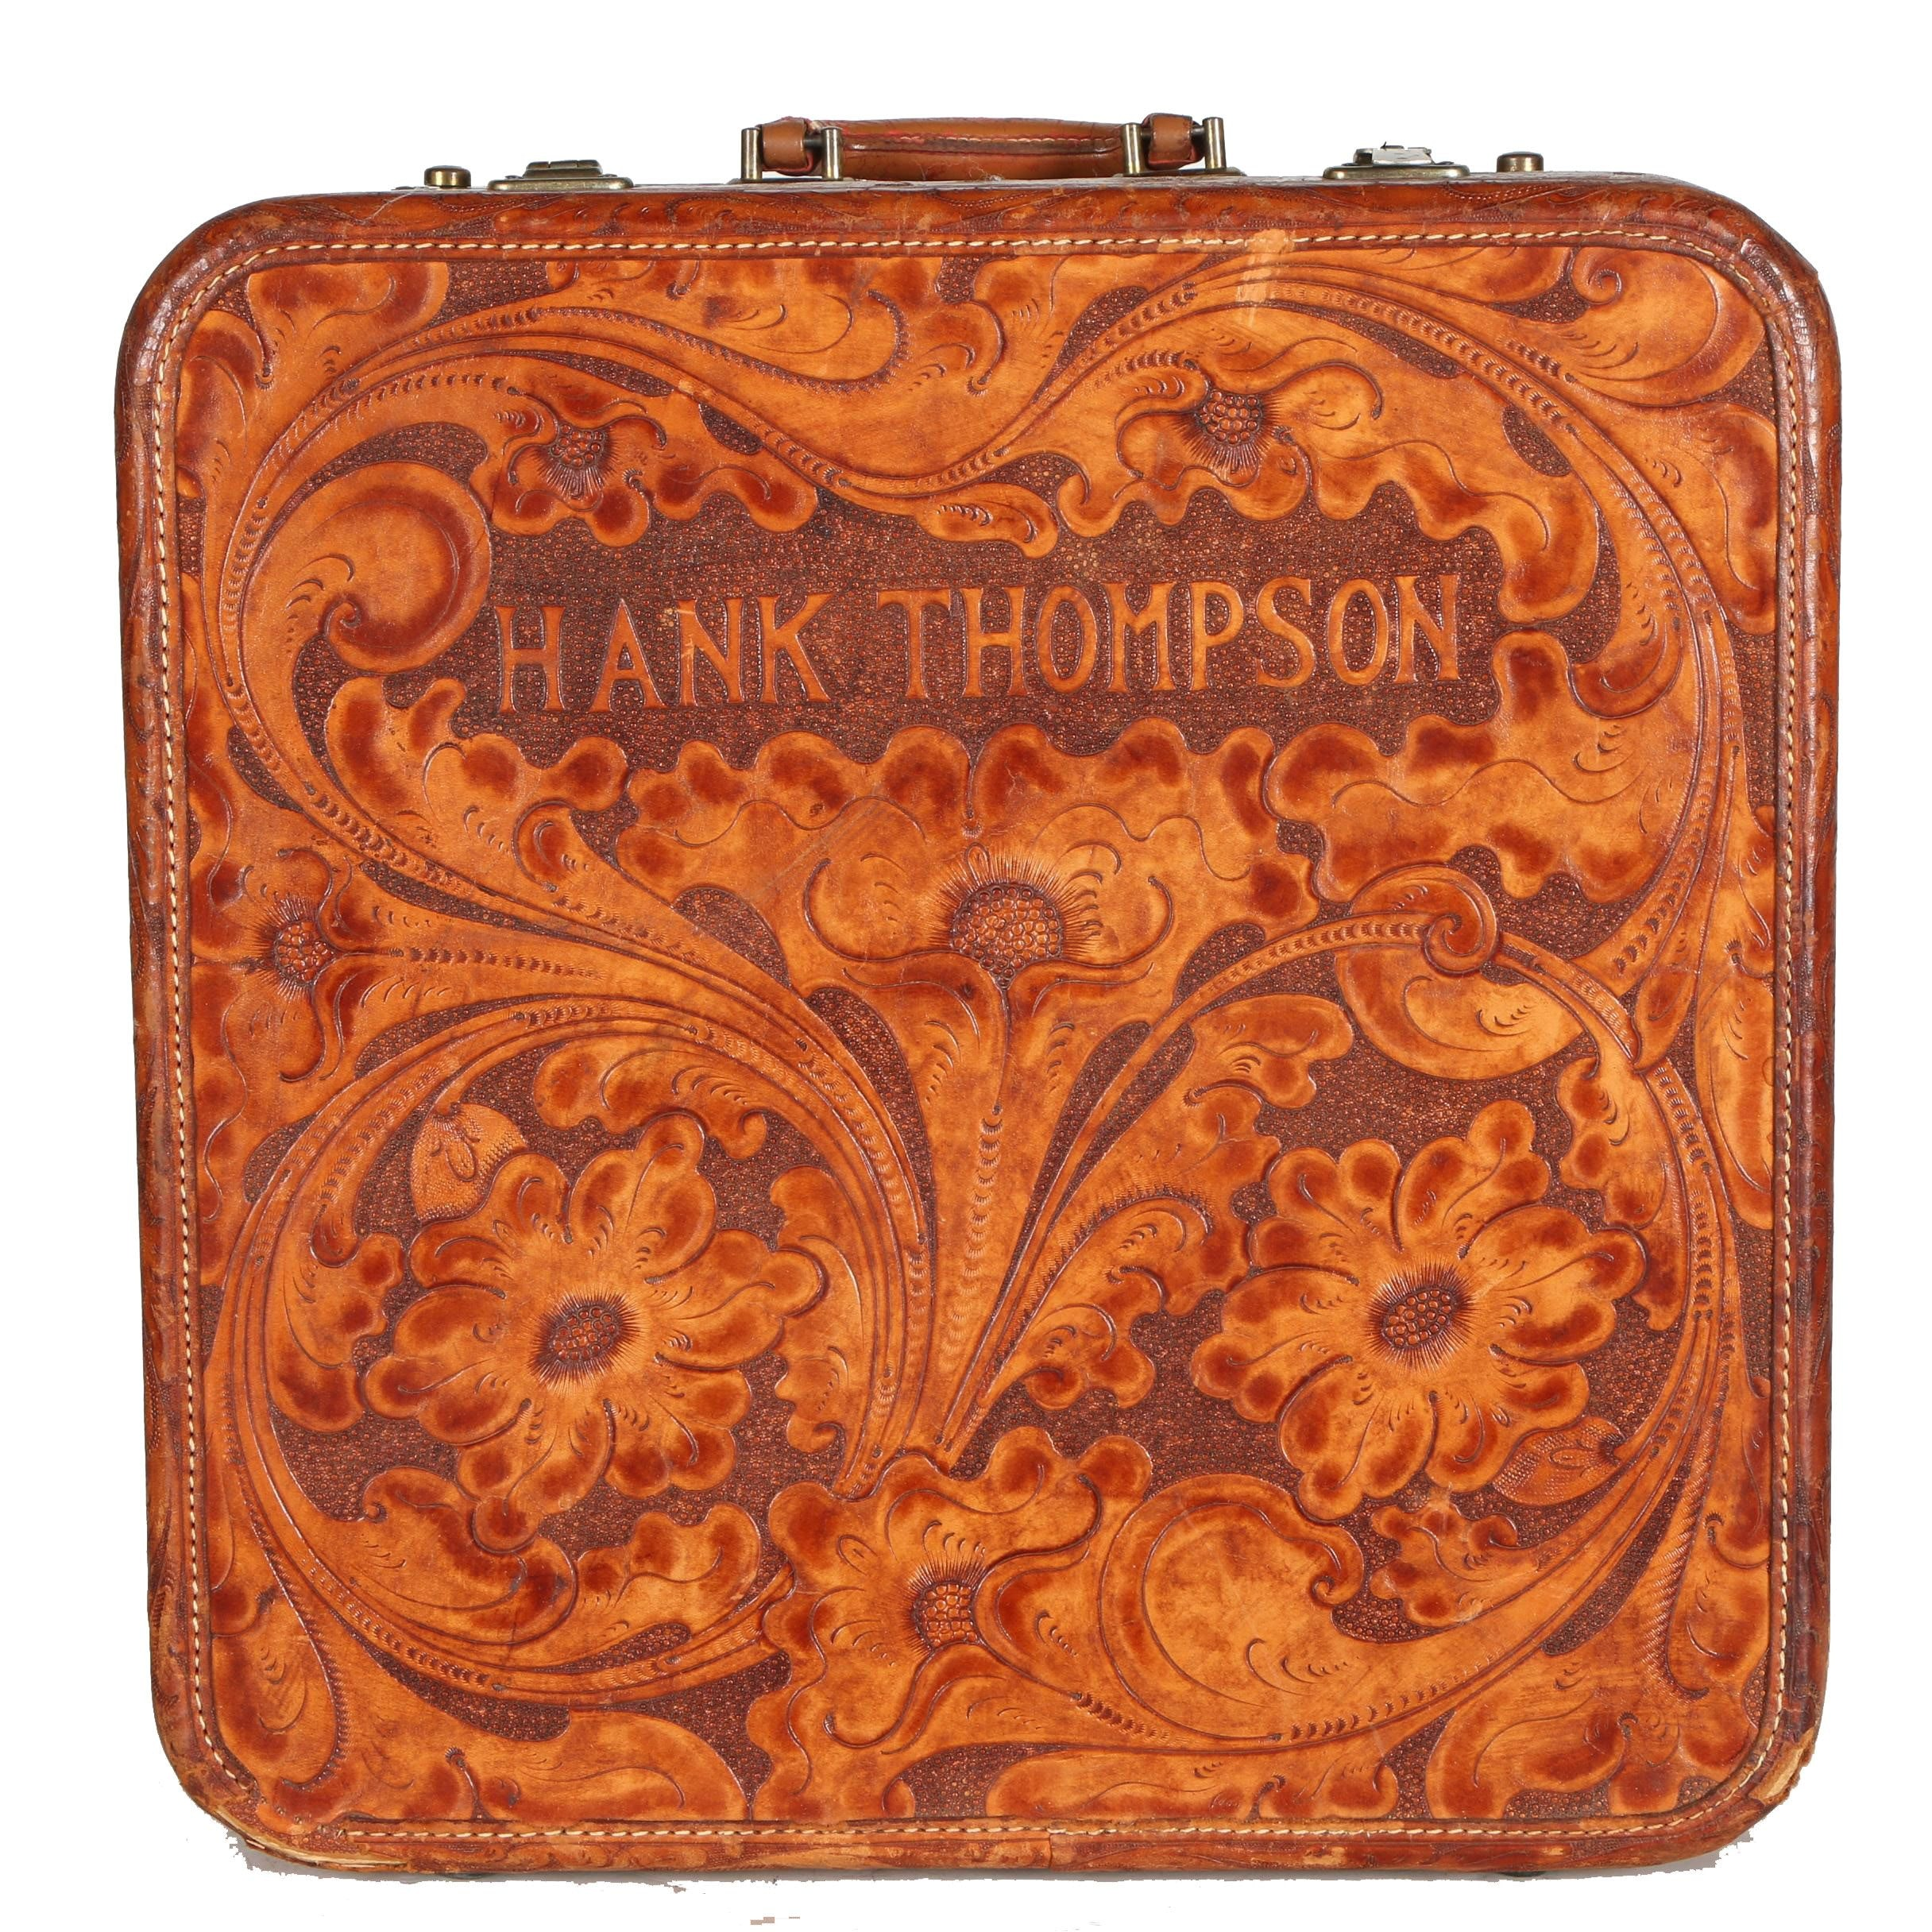 Circa 1957 Custom Roark Tooled Leather Case For Hank Thompson